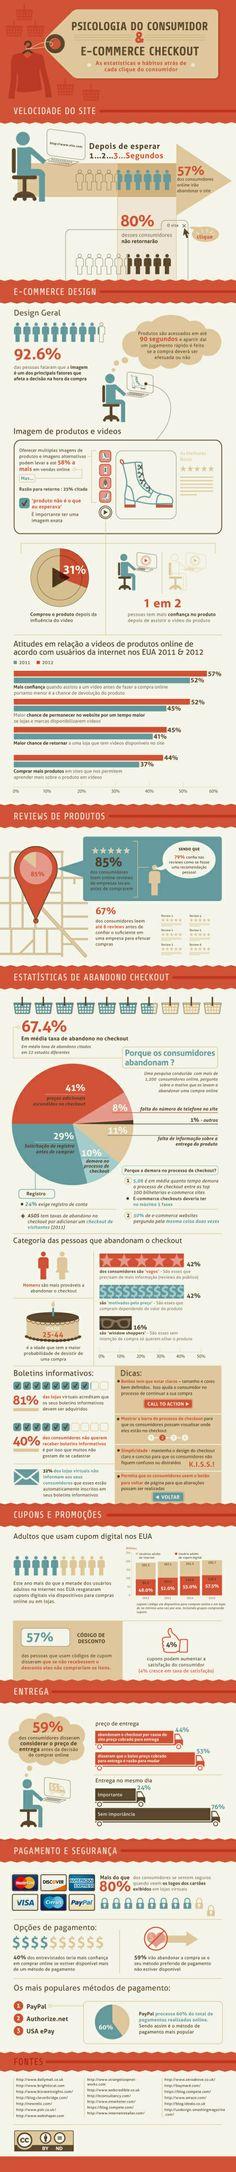 A psicologia do consumidor e e-commerce checkout